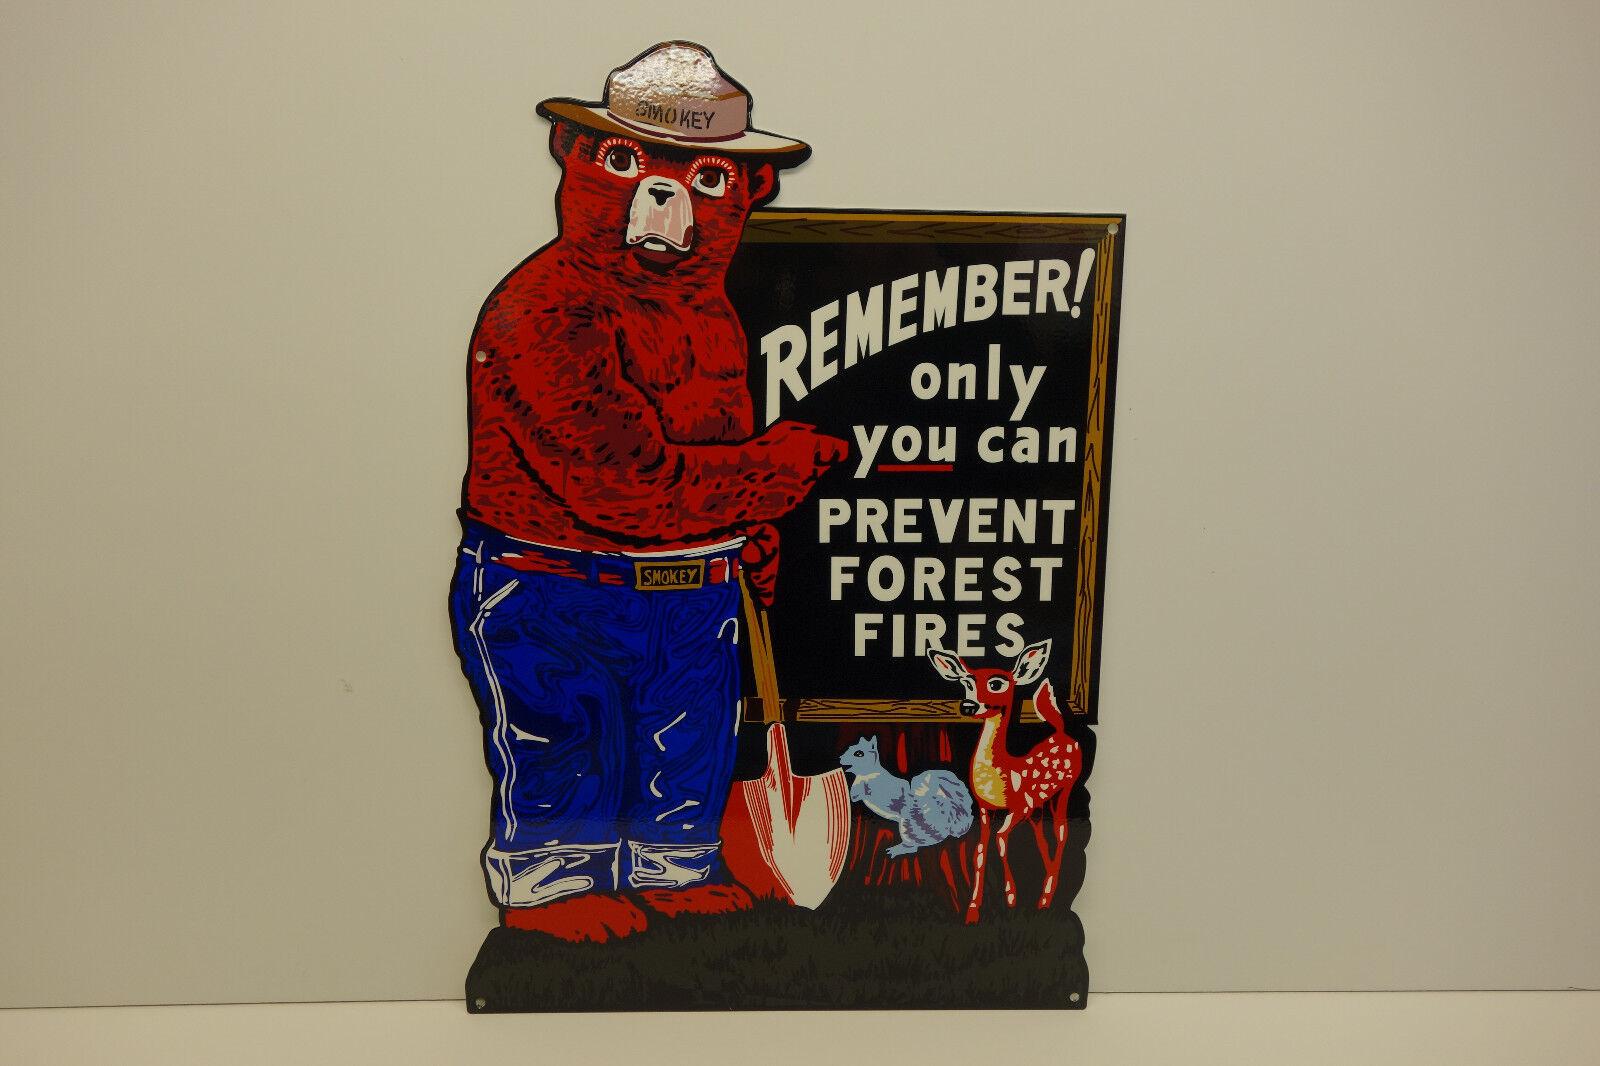 Esmalte de acero SMOKEY THE BEAR recordar solamente puedes prevenir signo 21 X 14 1 4